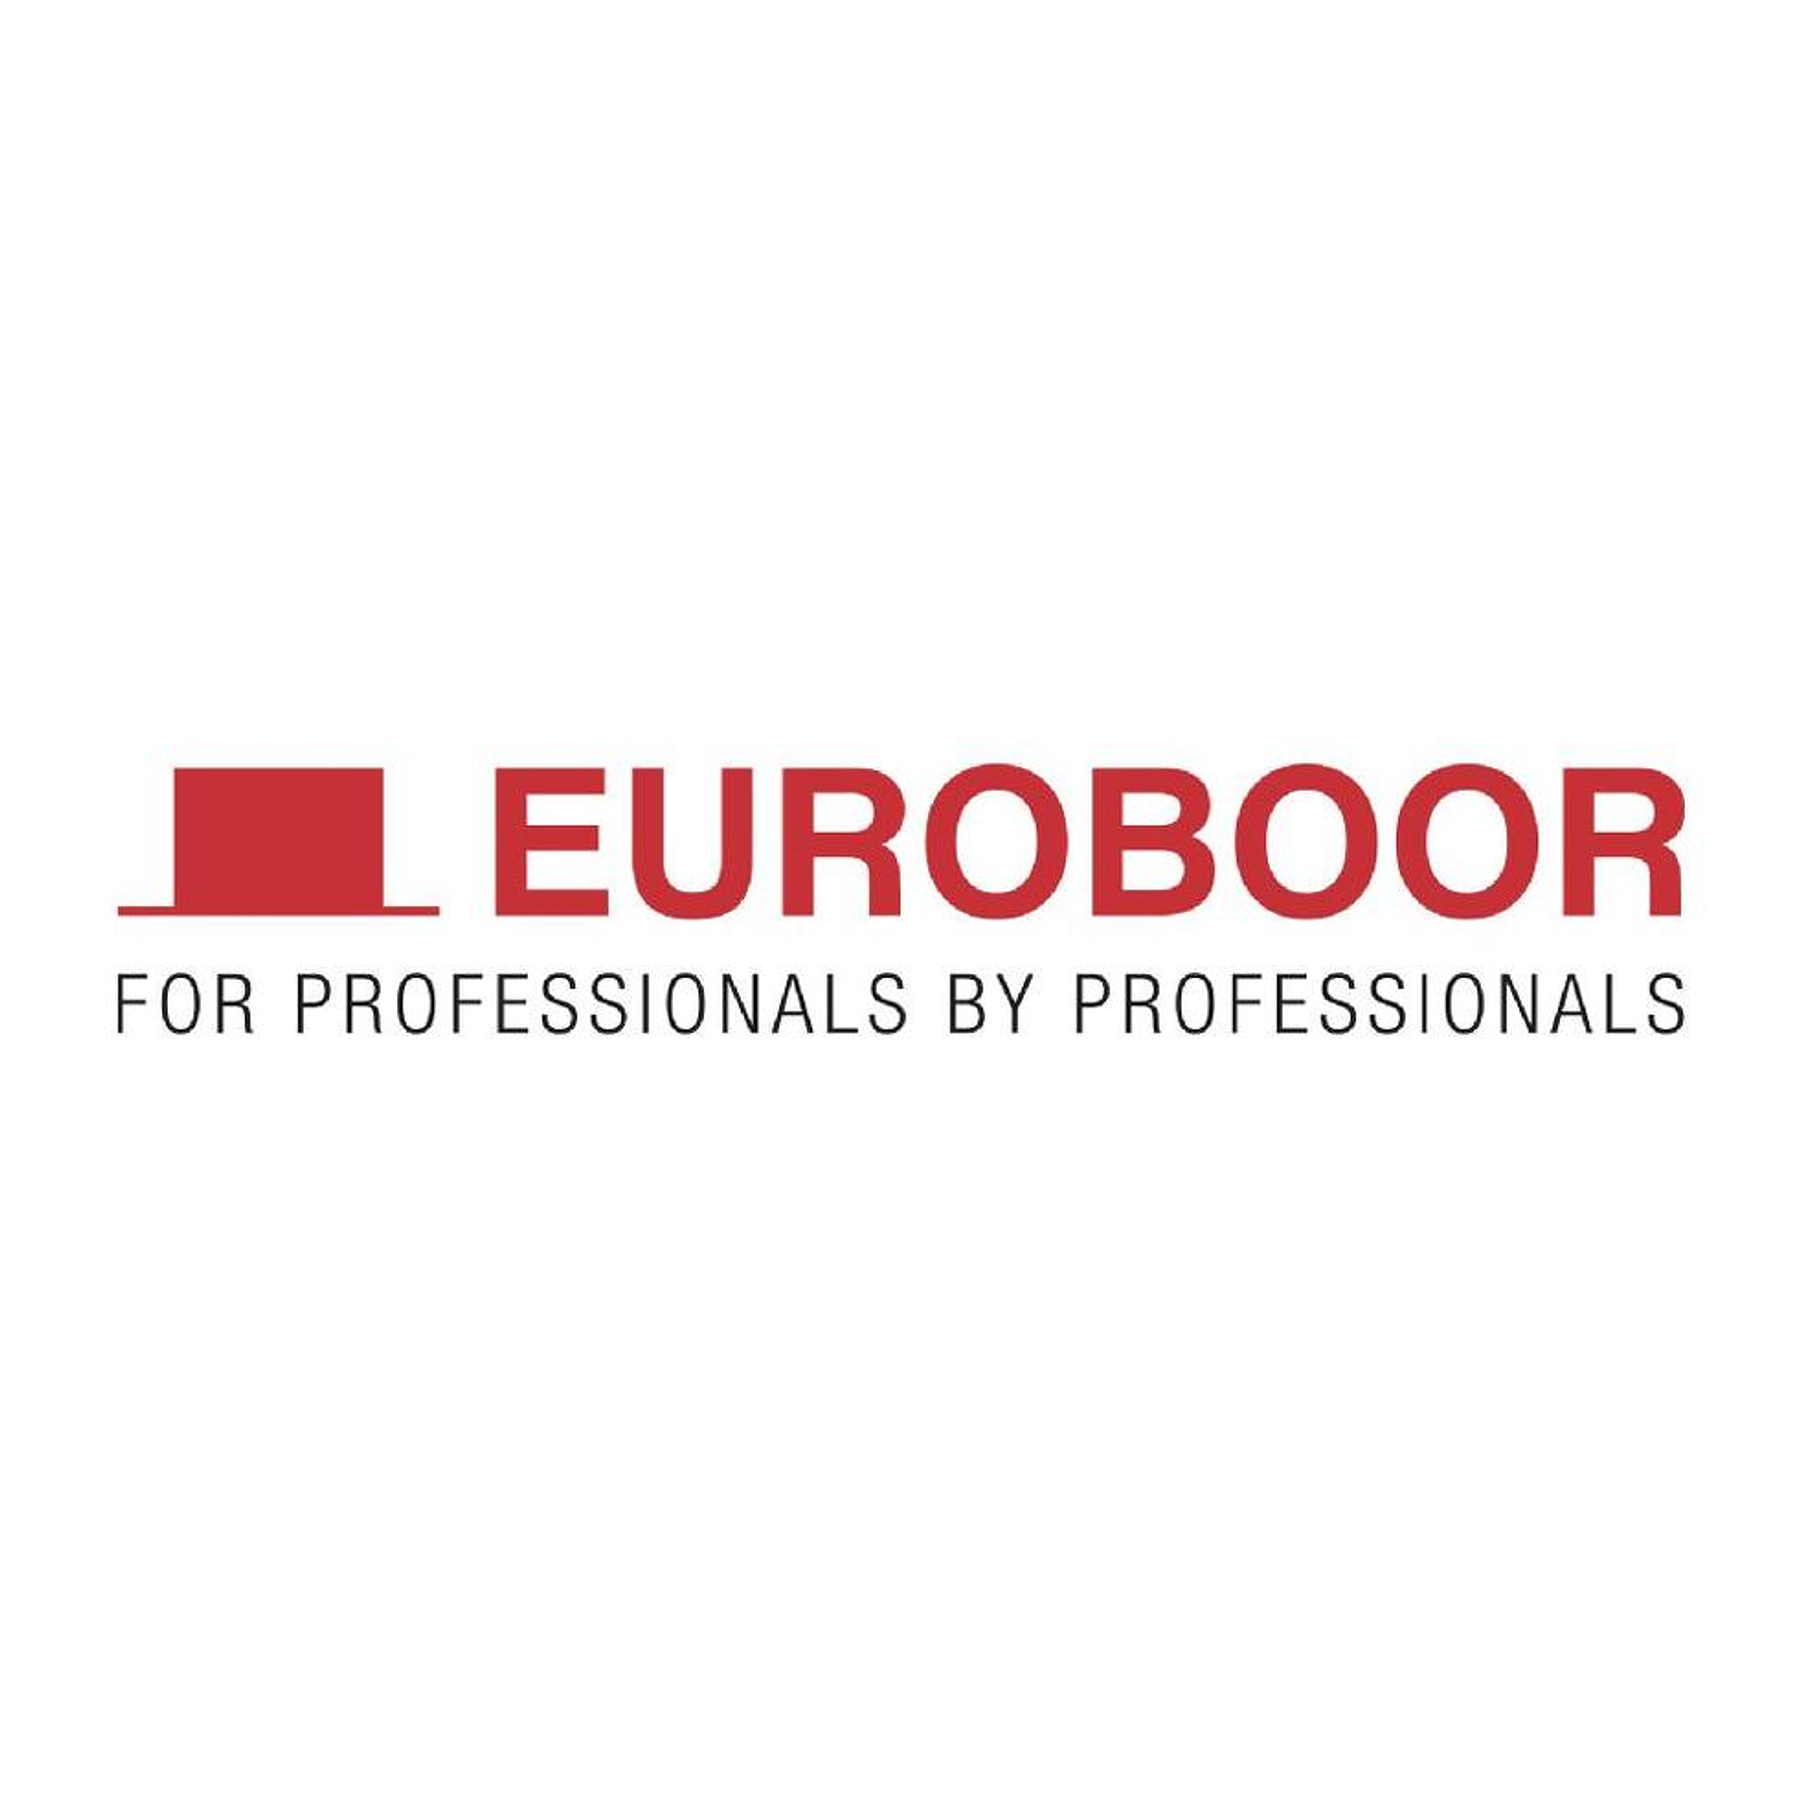 Taladro con base magnetica Euroboor Eco 80T